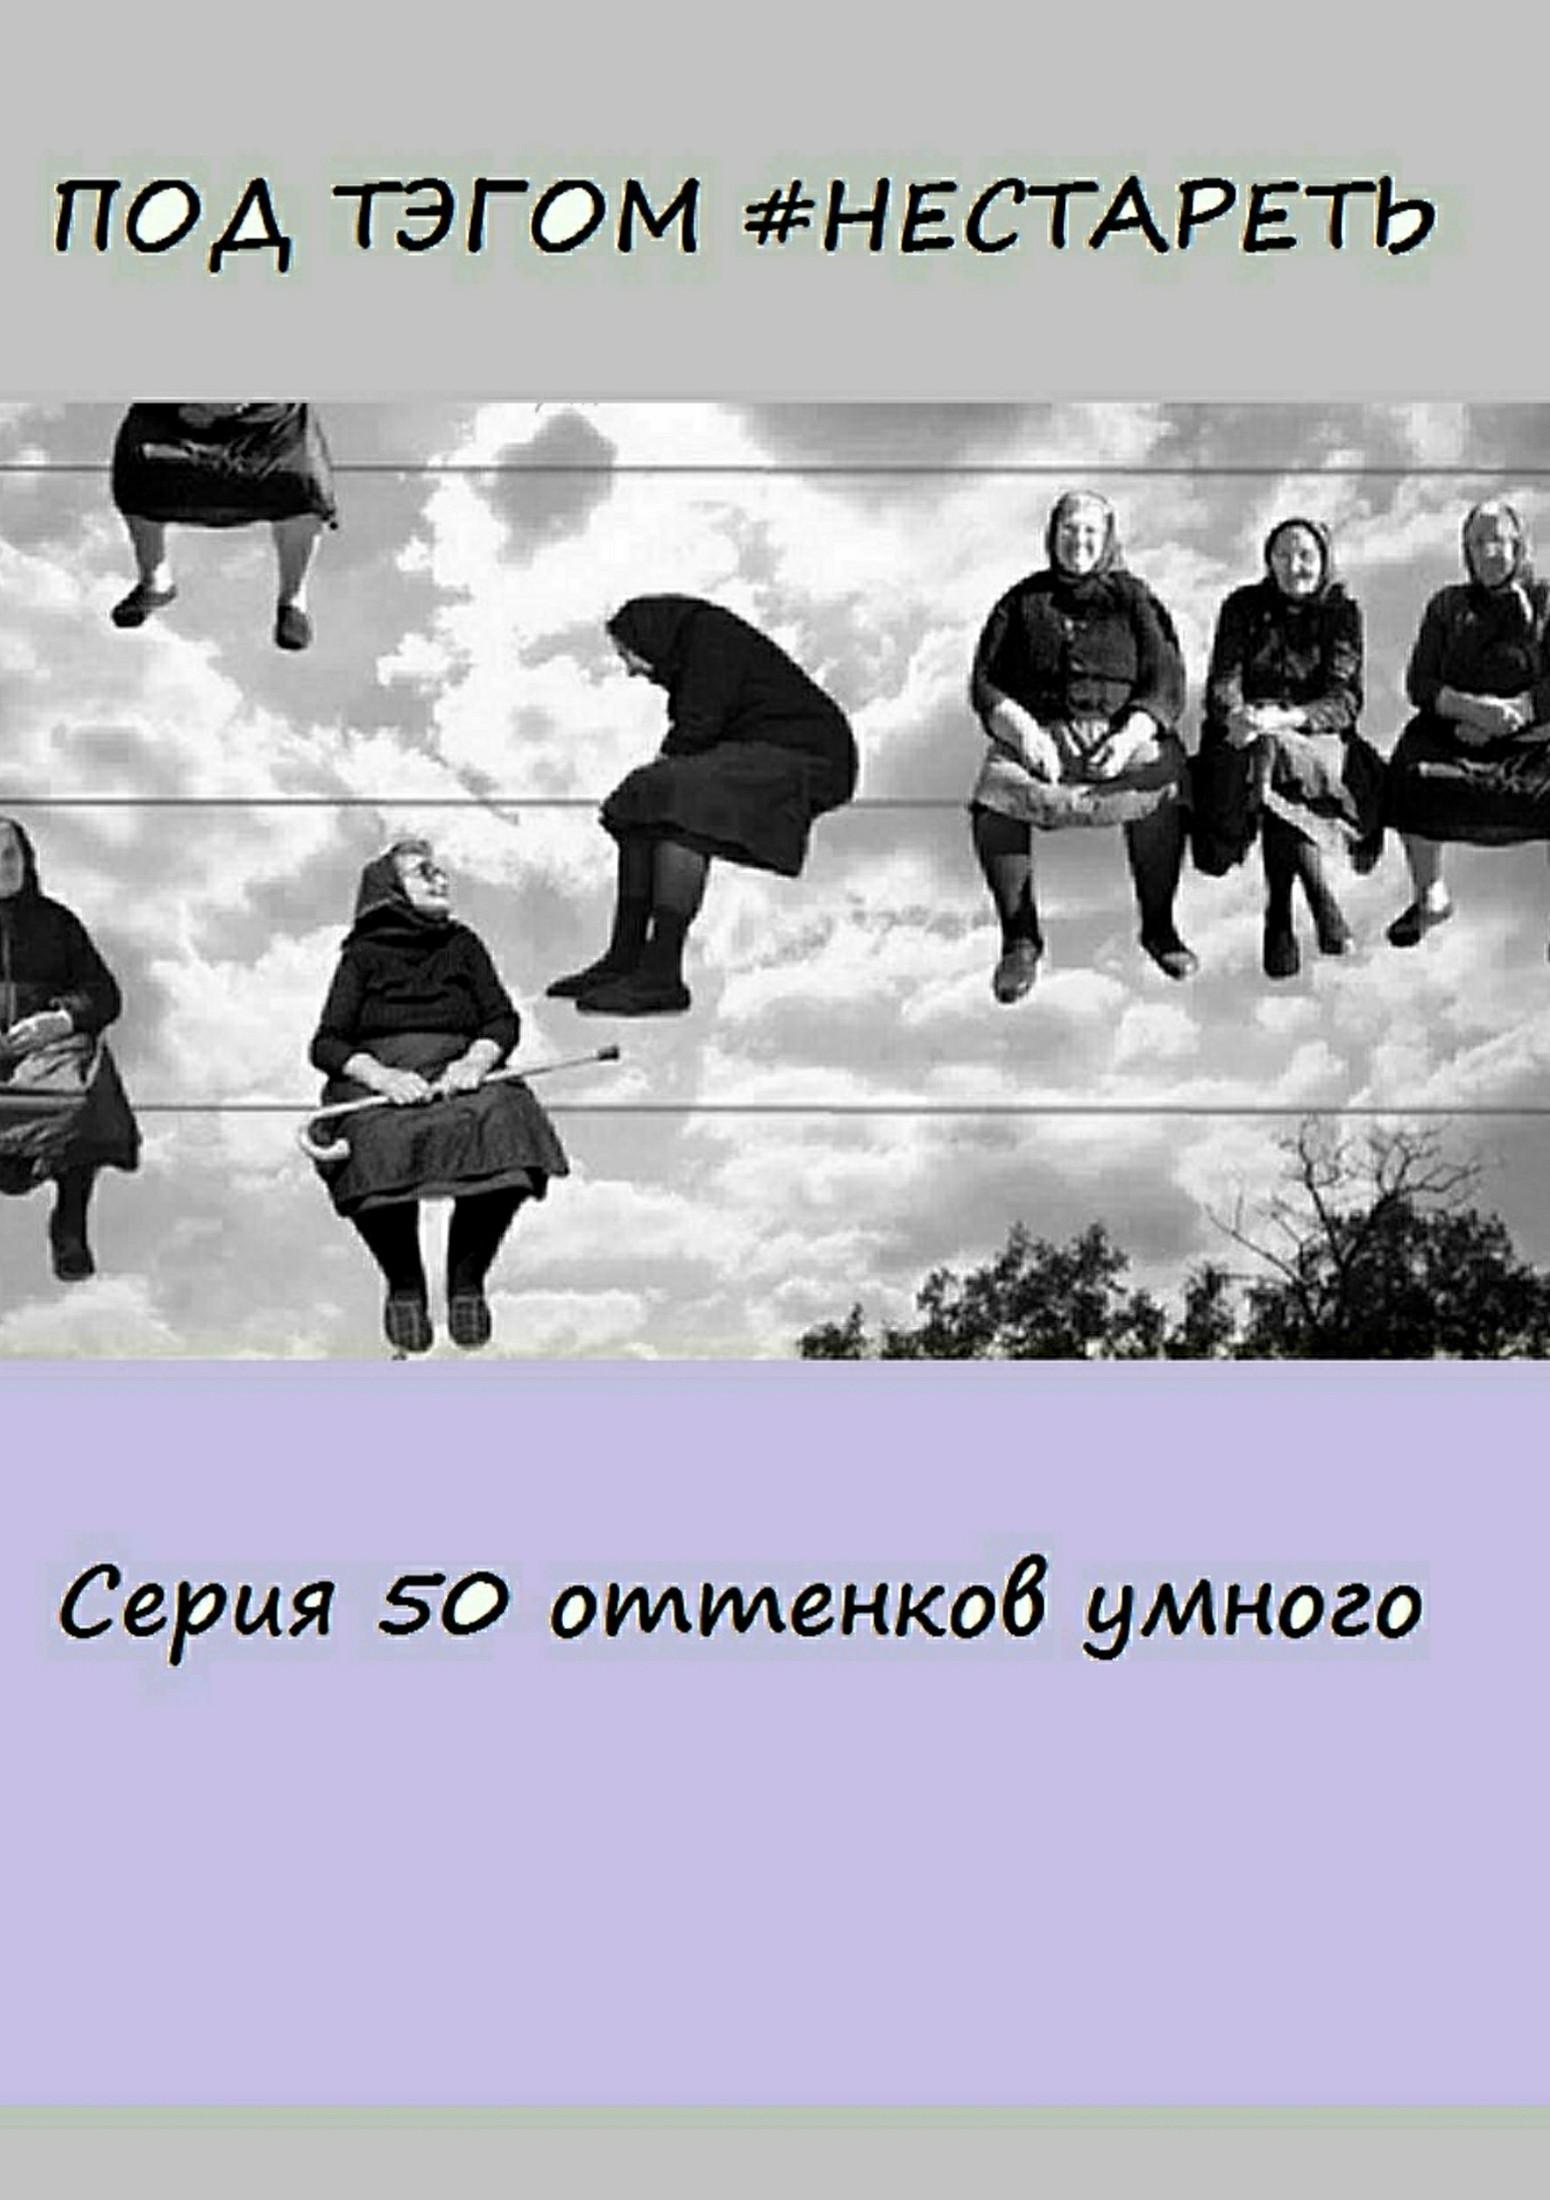 Обложка книги Под тэгом #НЕСТАРЕТЬ, автор Алена Пиронко